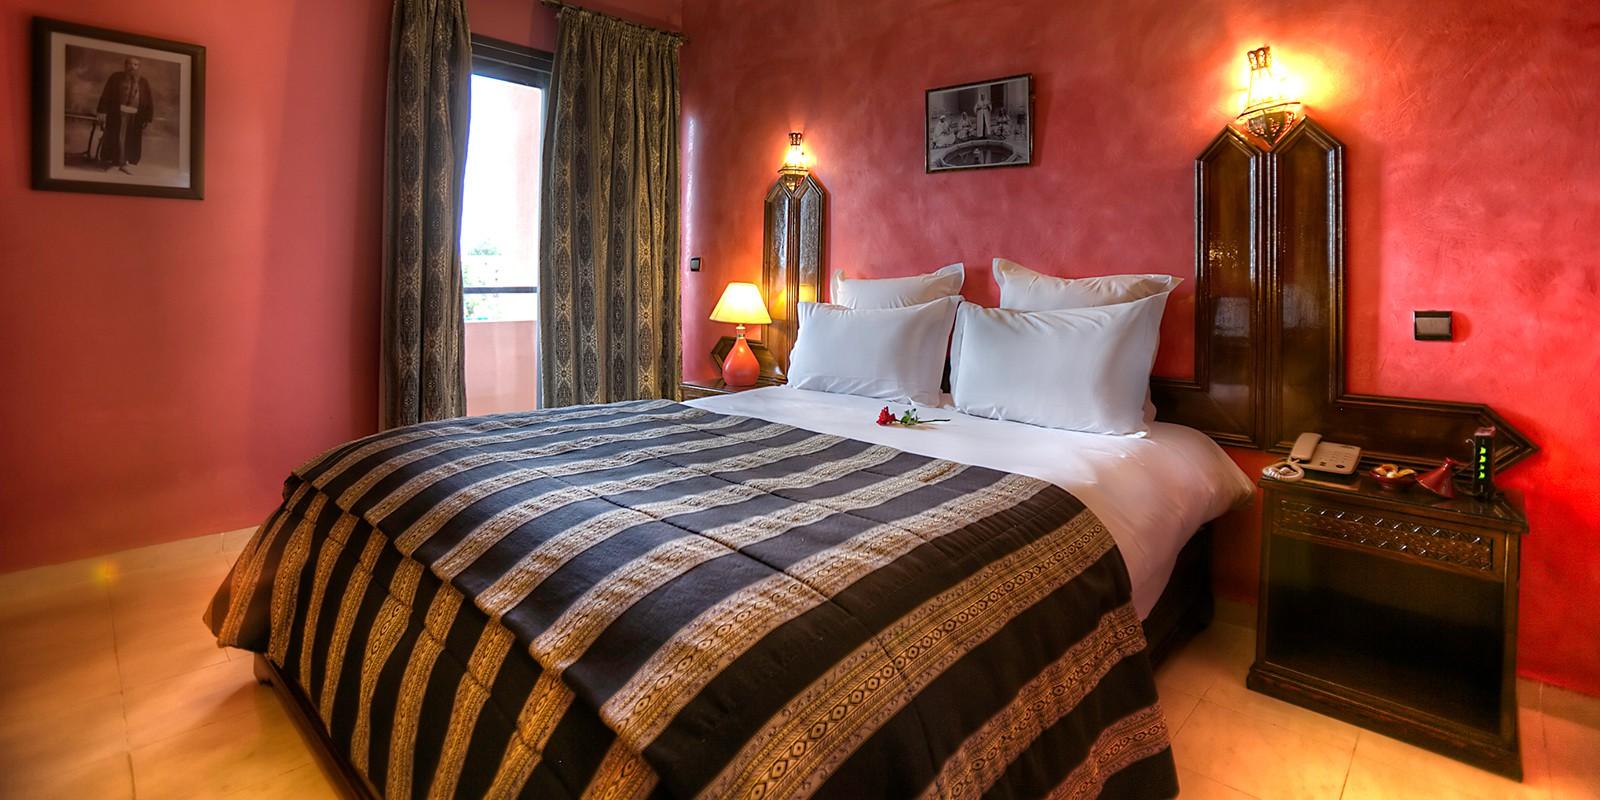 Courtesy of Hotel Amani Marrakech / Hotels.com